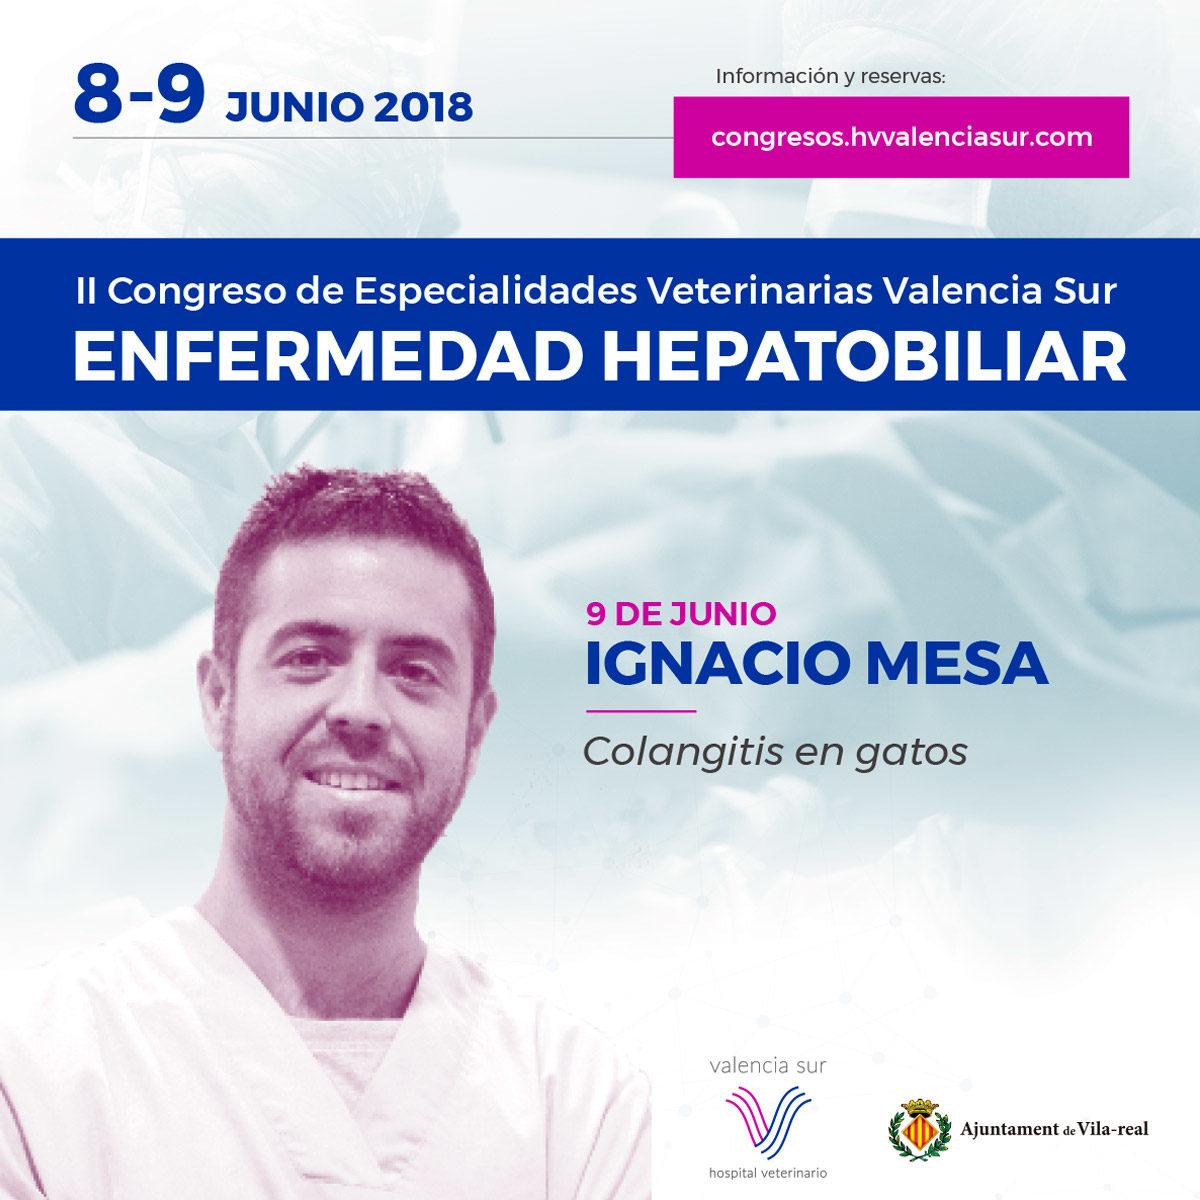 02Ponentes CongresoValenciaSur